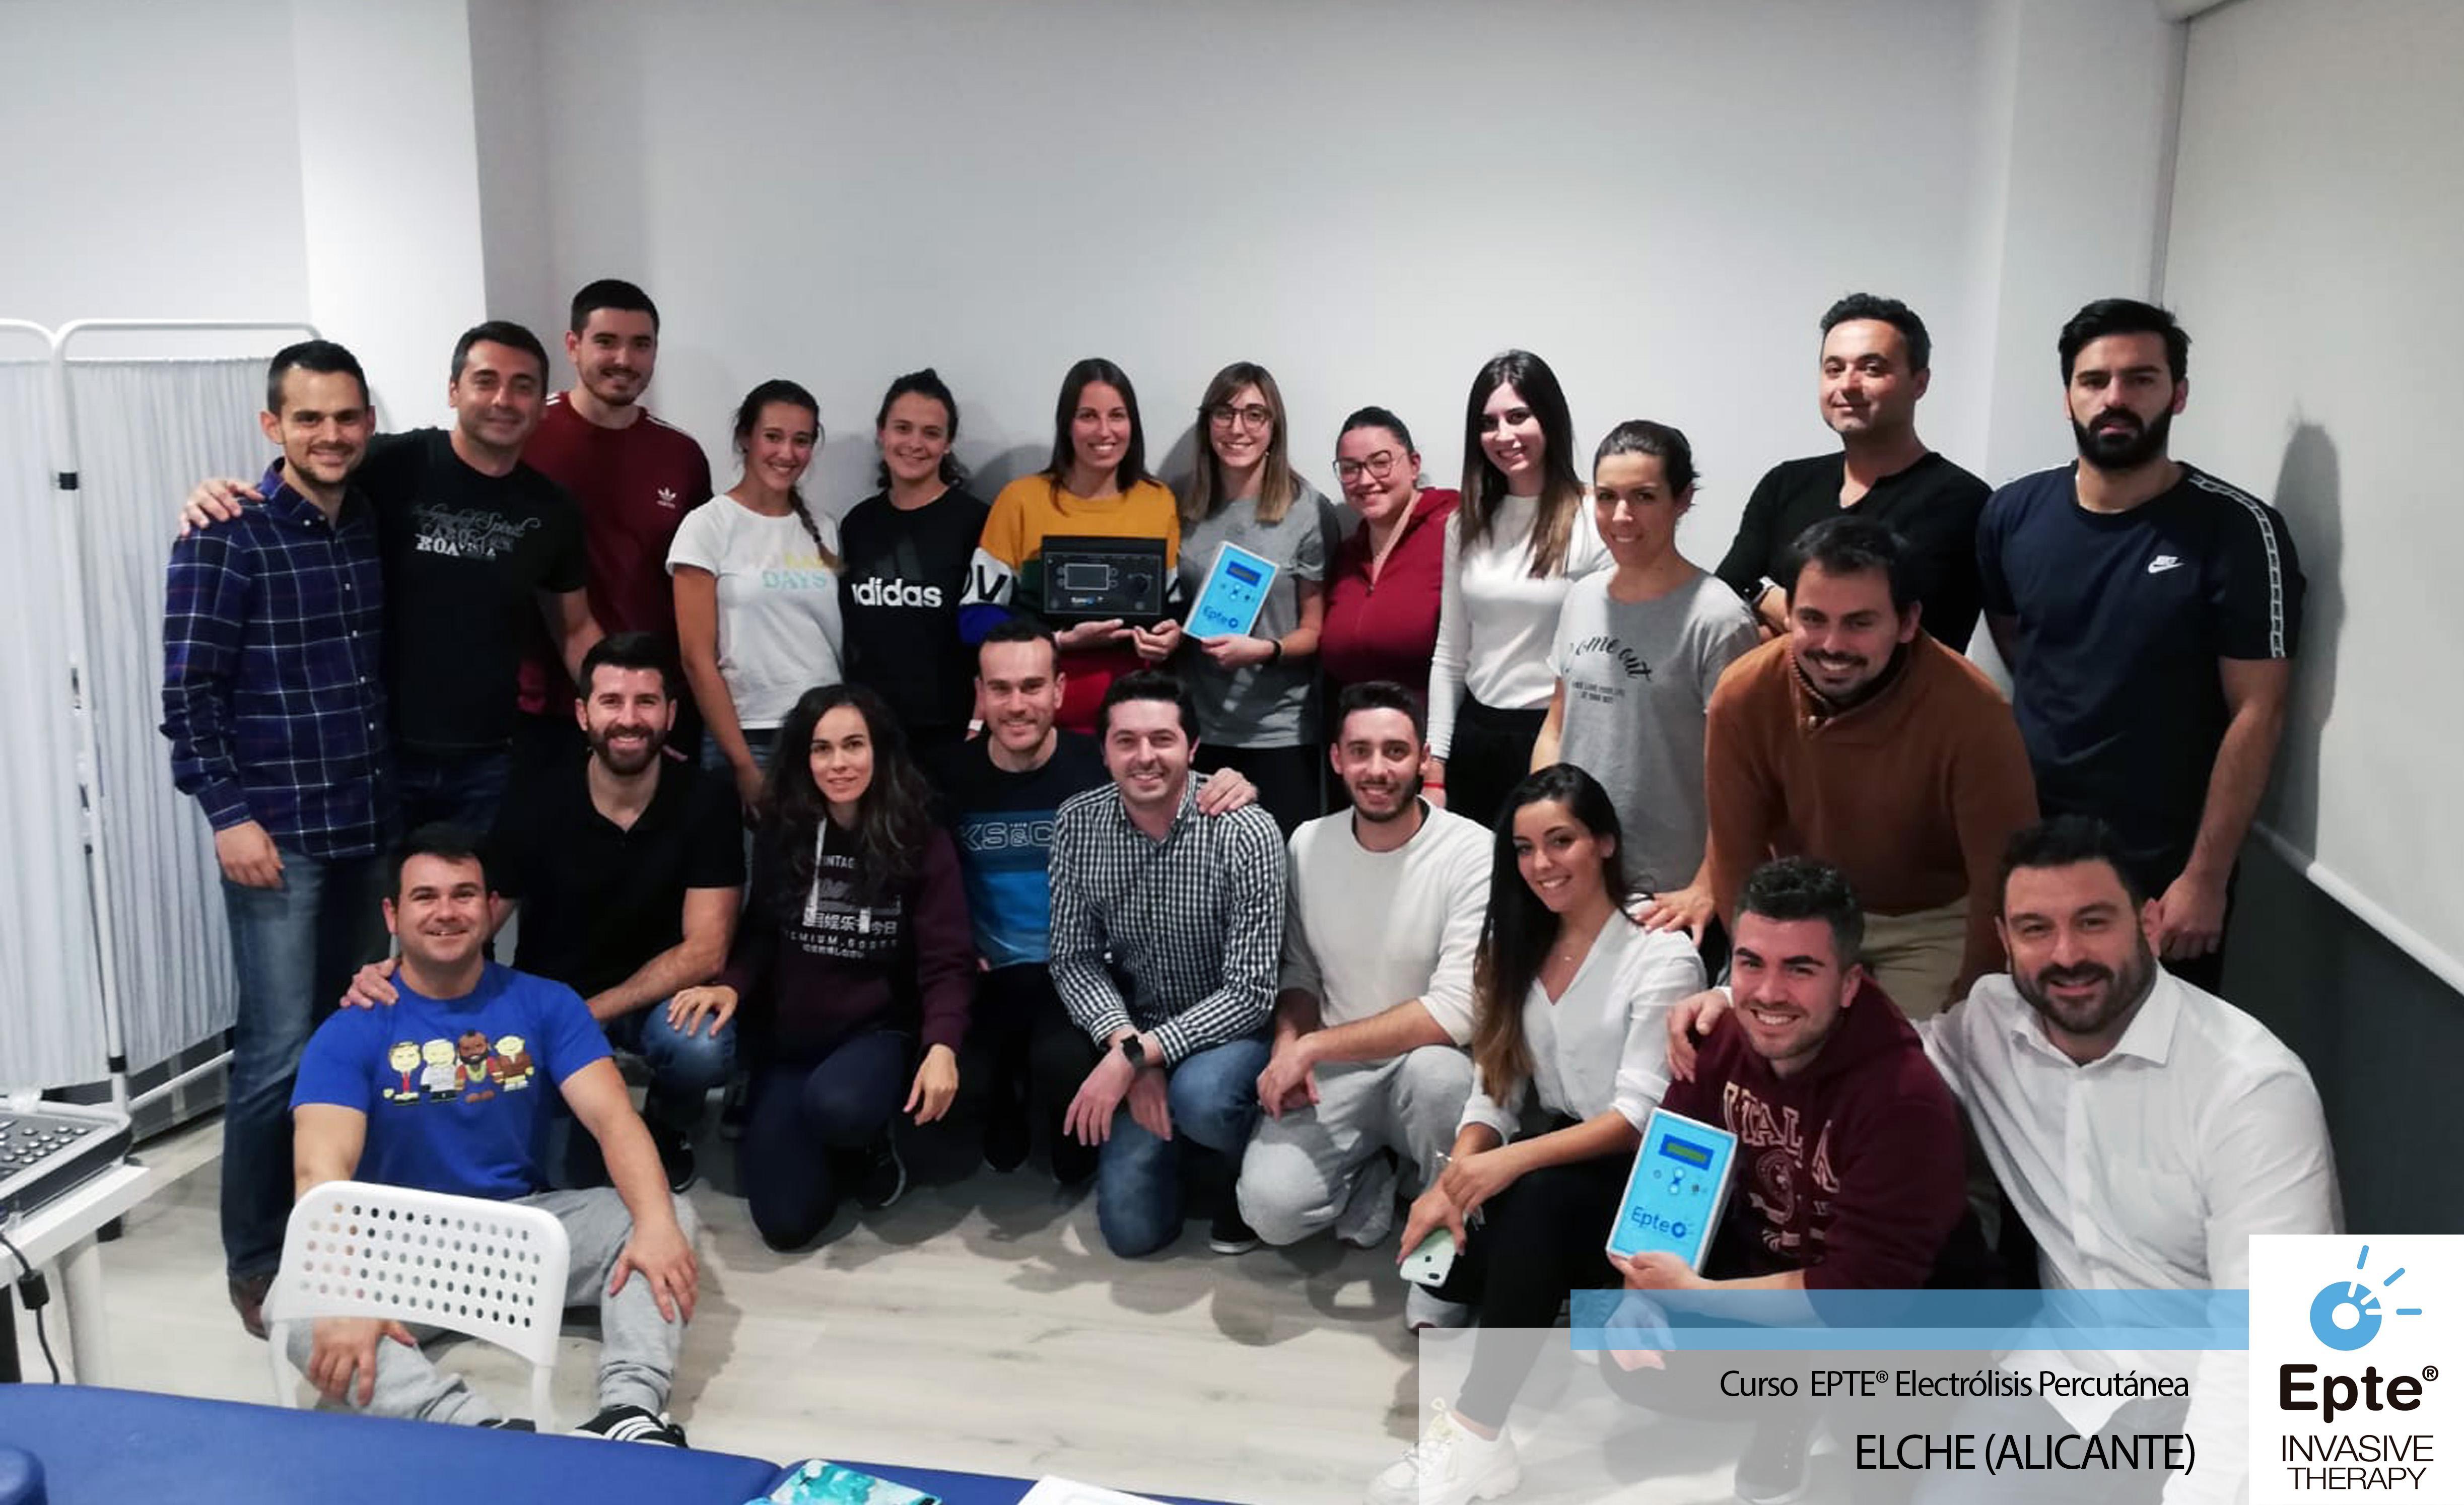 Formación en Fisioterapia Curso EPTE electrolisis percutánea + ecografía en Elche, Alicante